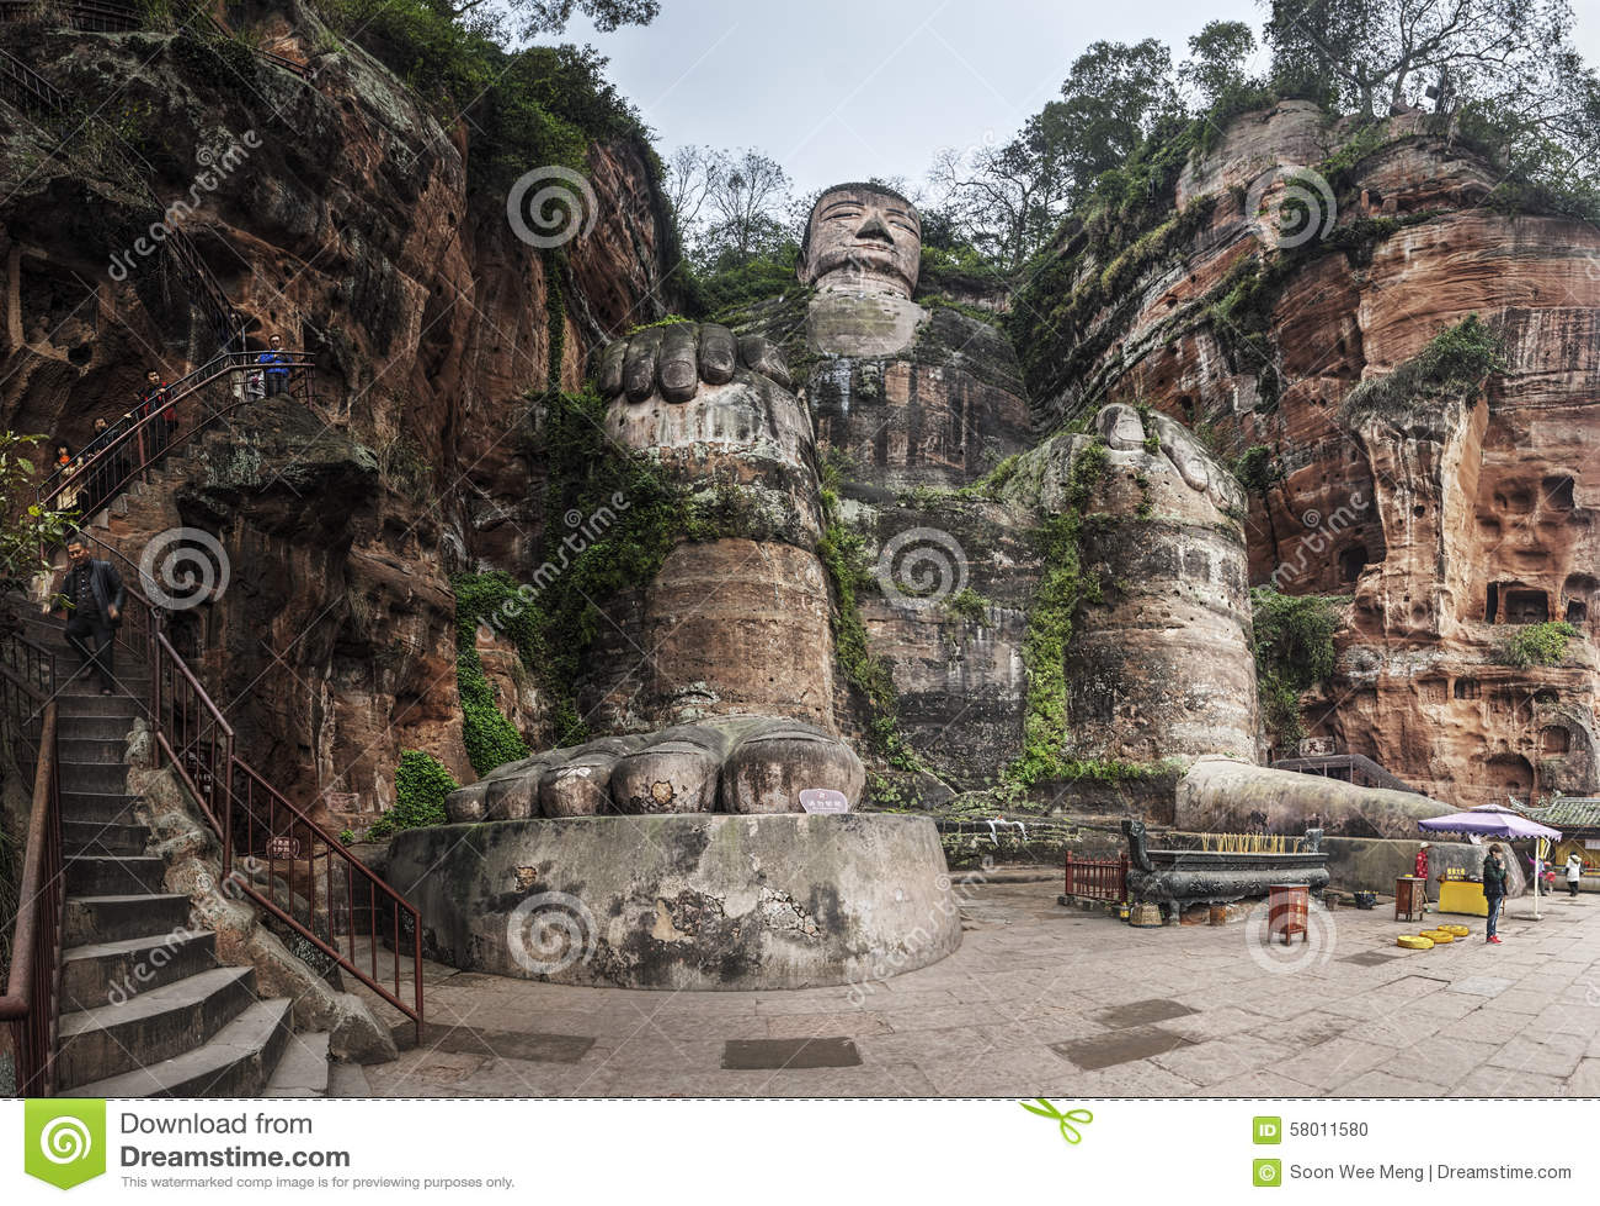 El gigante Buda de Leshan en Chengdu, China